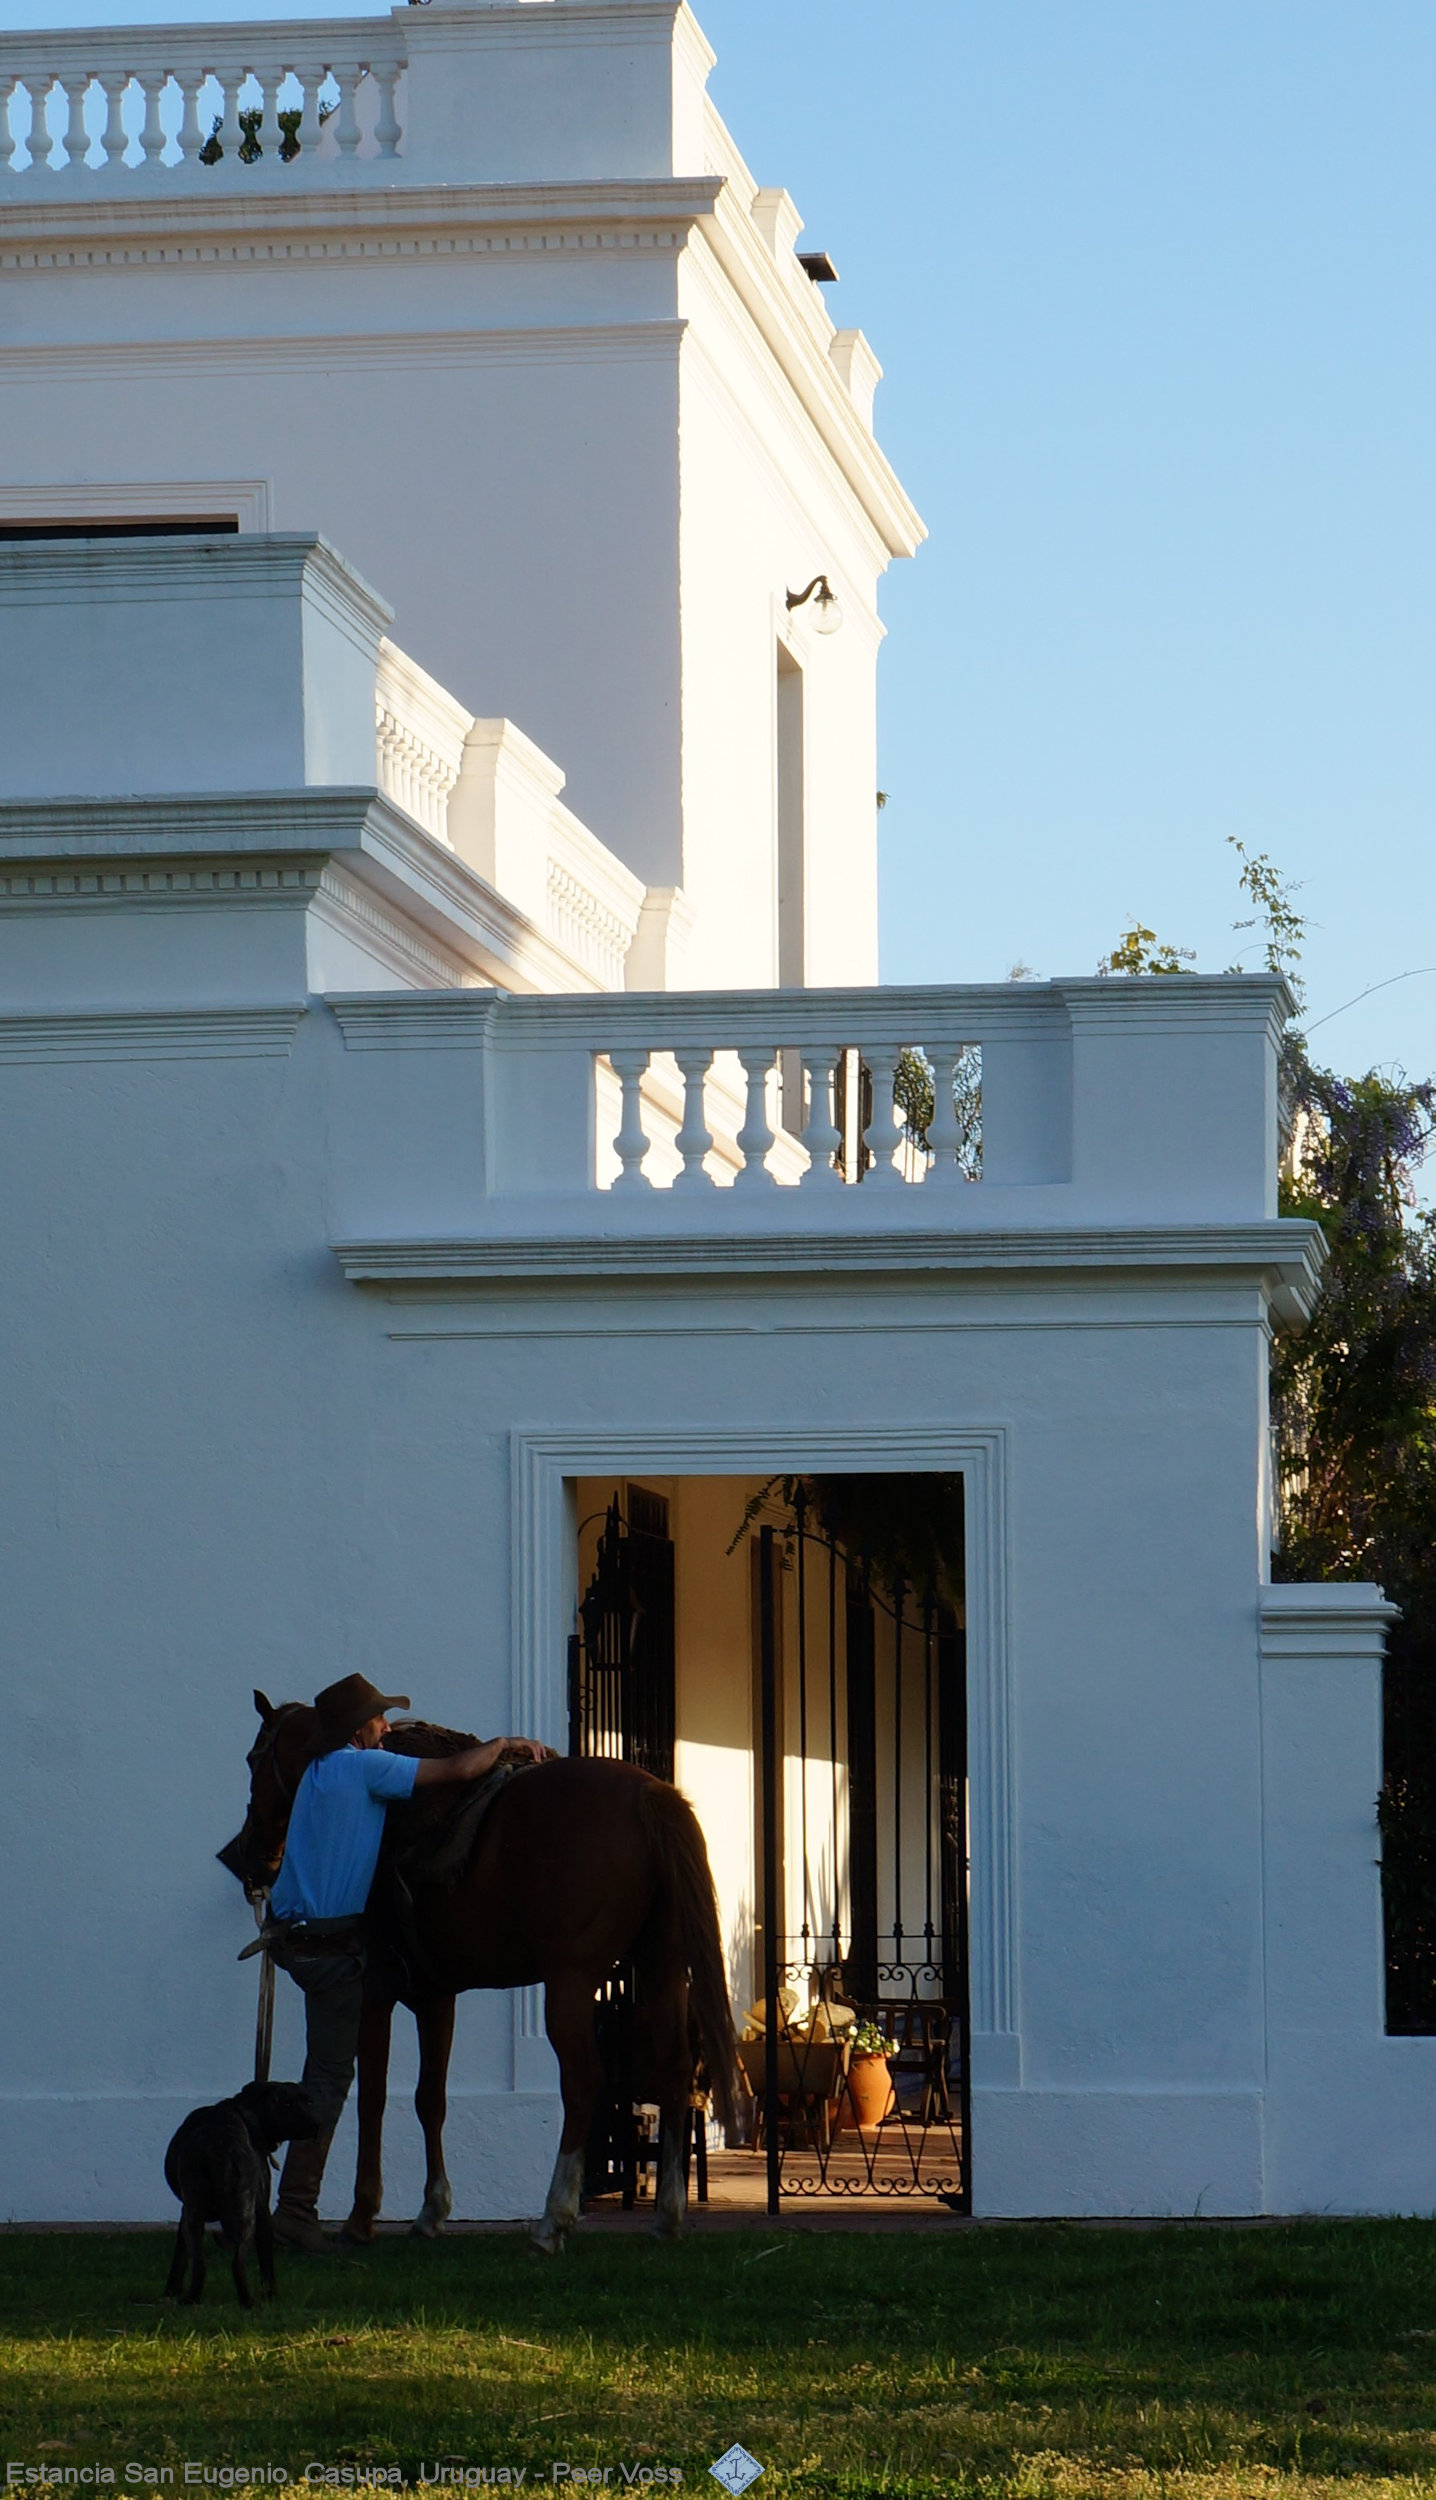 estancia and horseman Uruguay